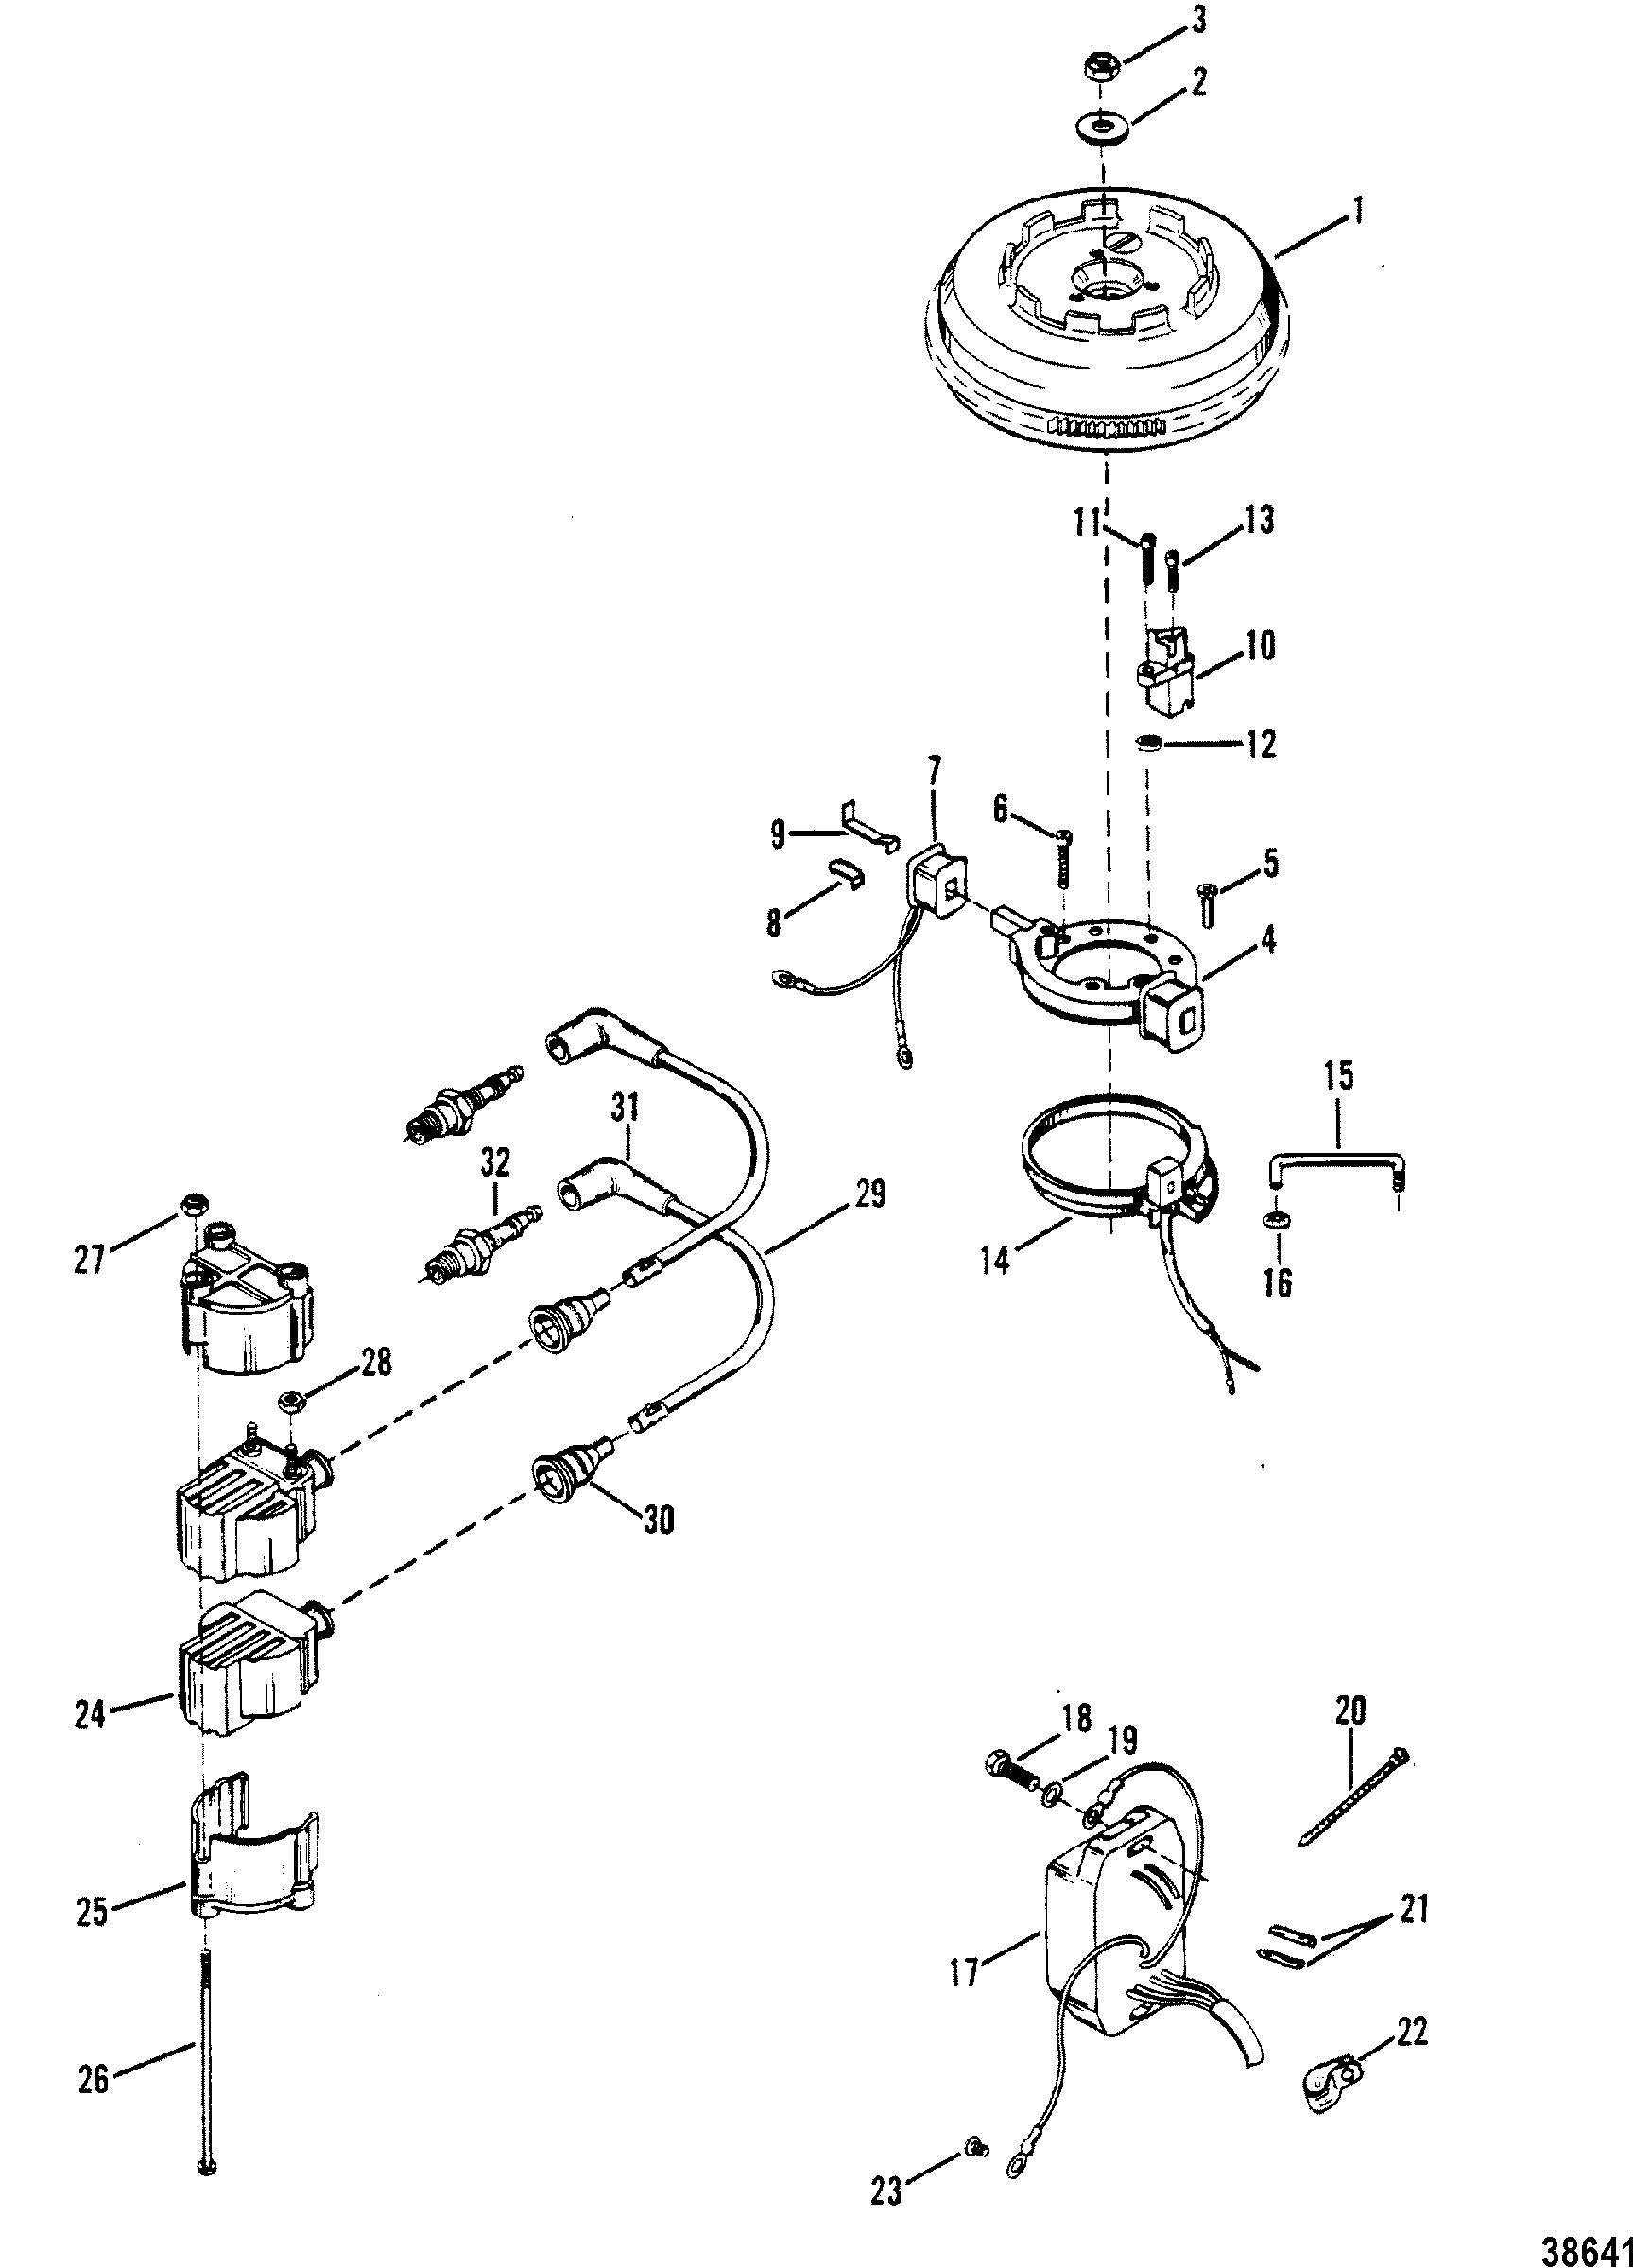 Shovelhead Stator Parts Diagram